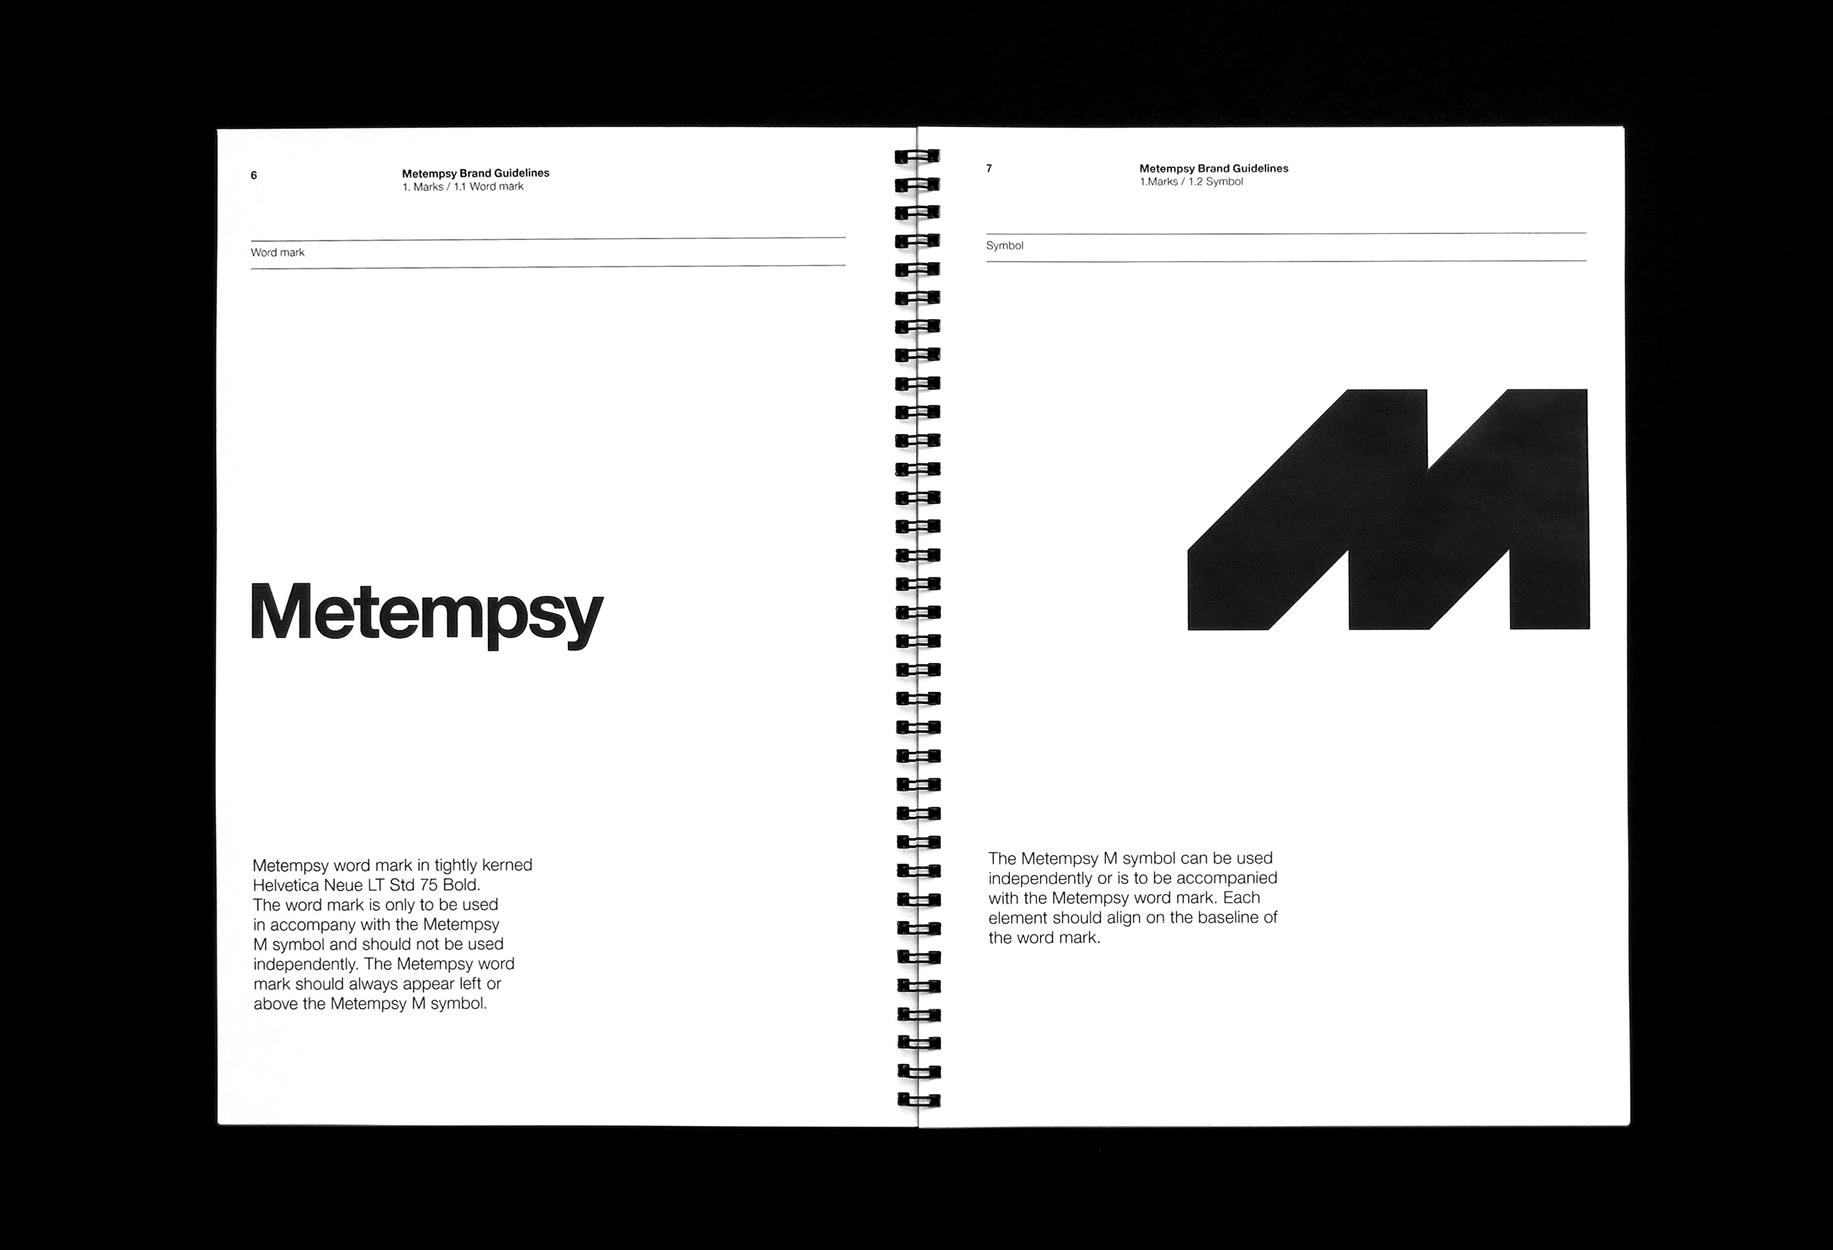 Metempsy-Graphic-Design-Standards-Manual-4.jpg